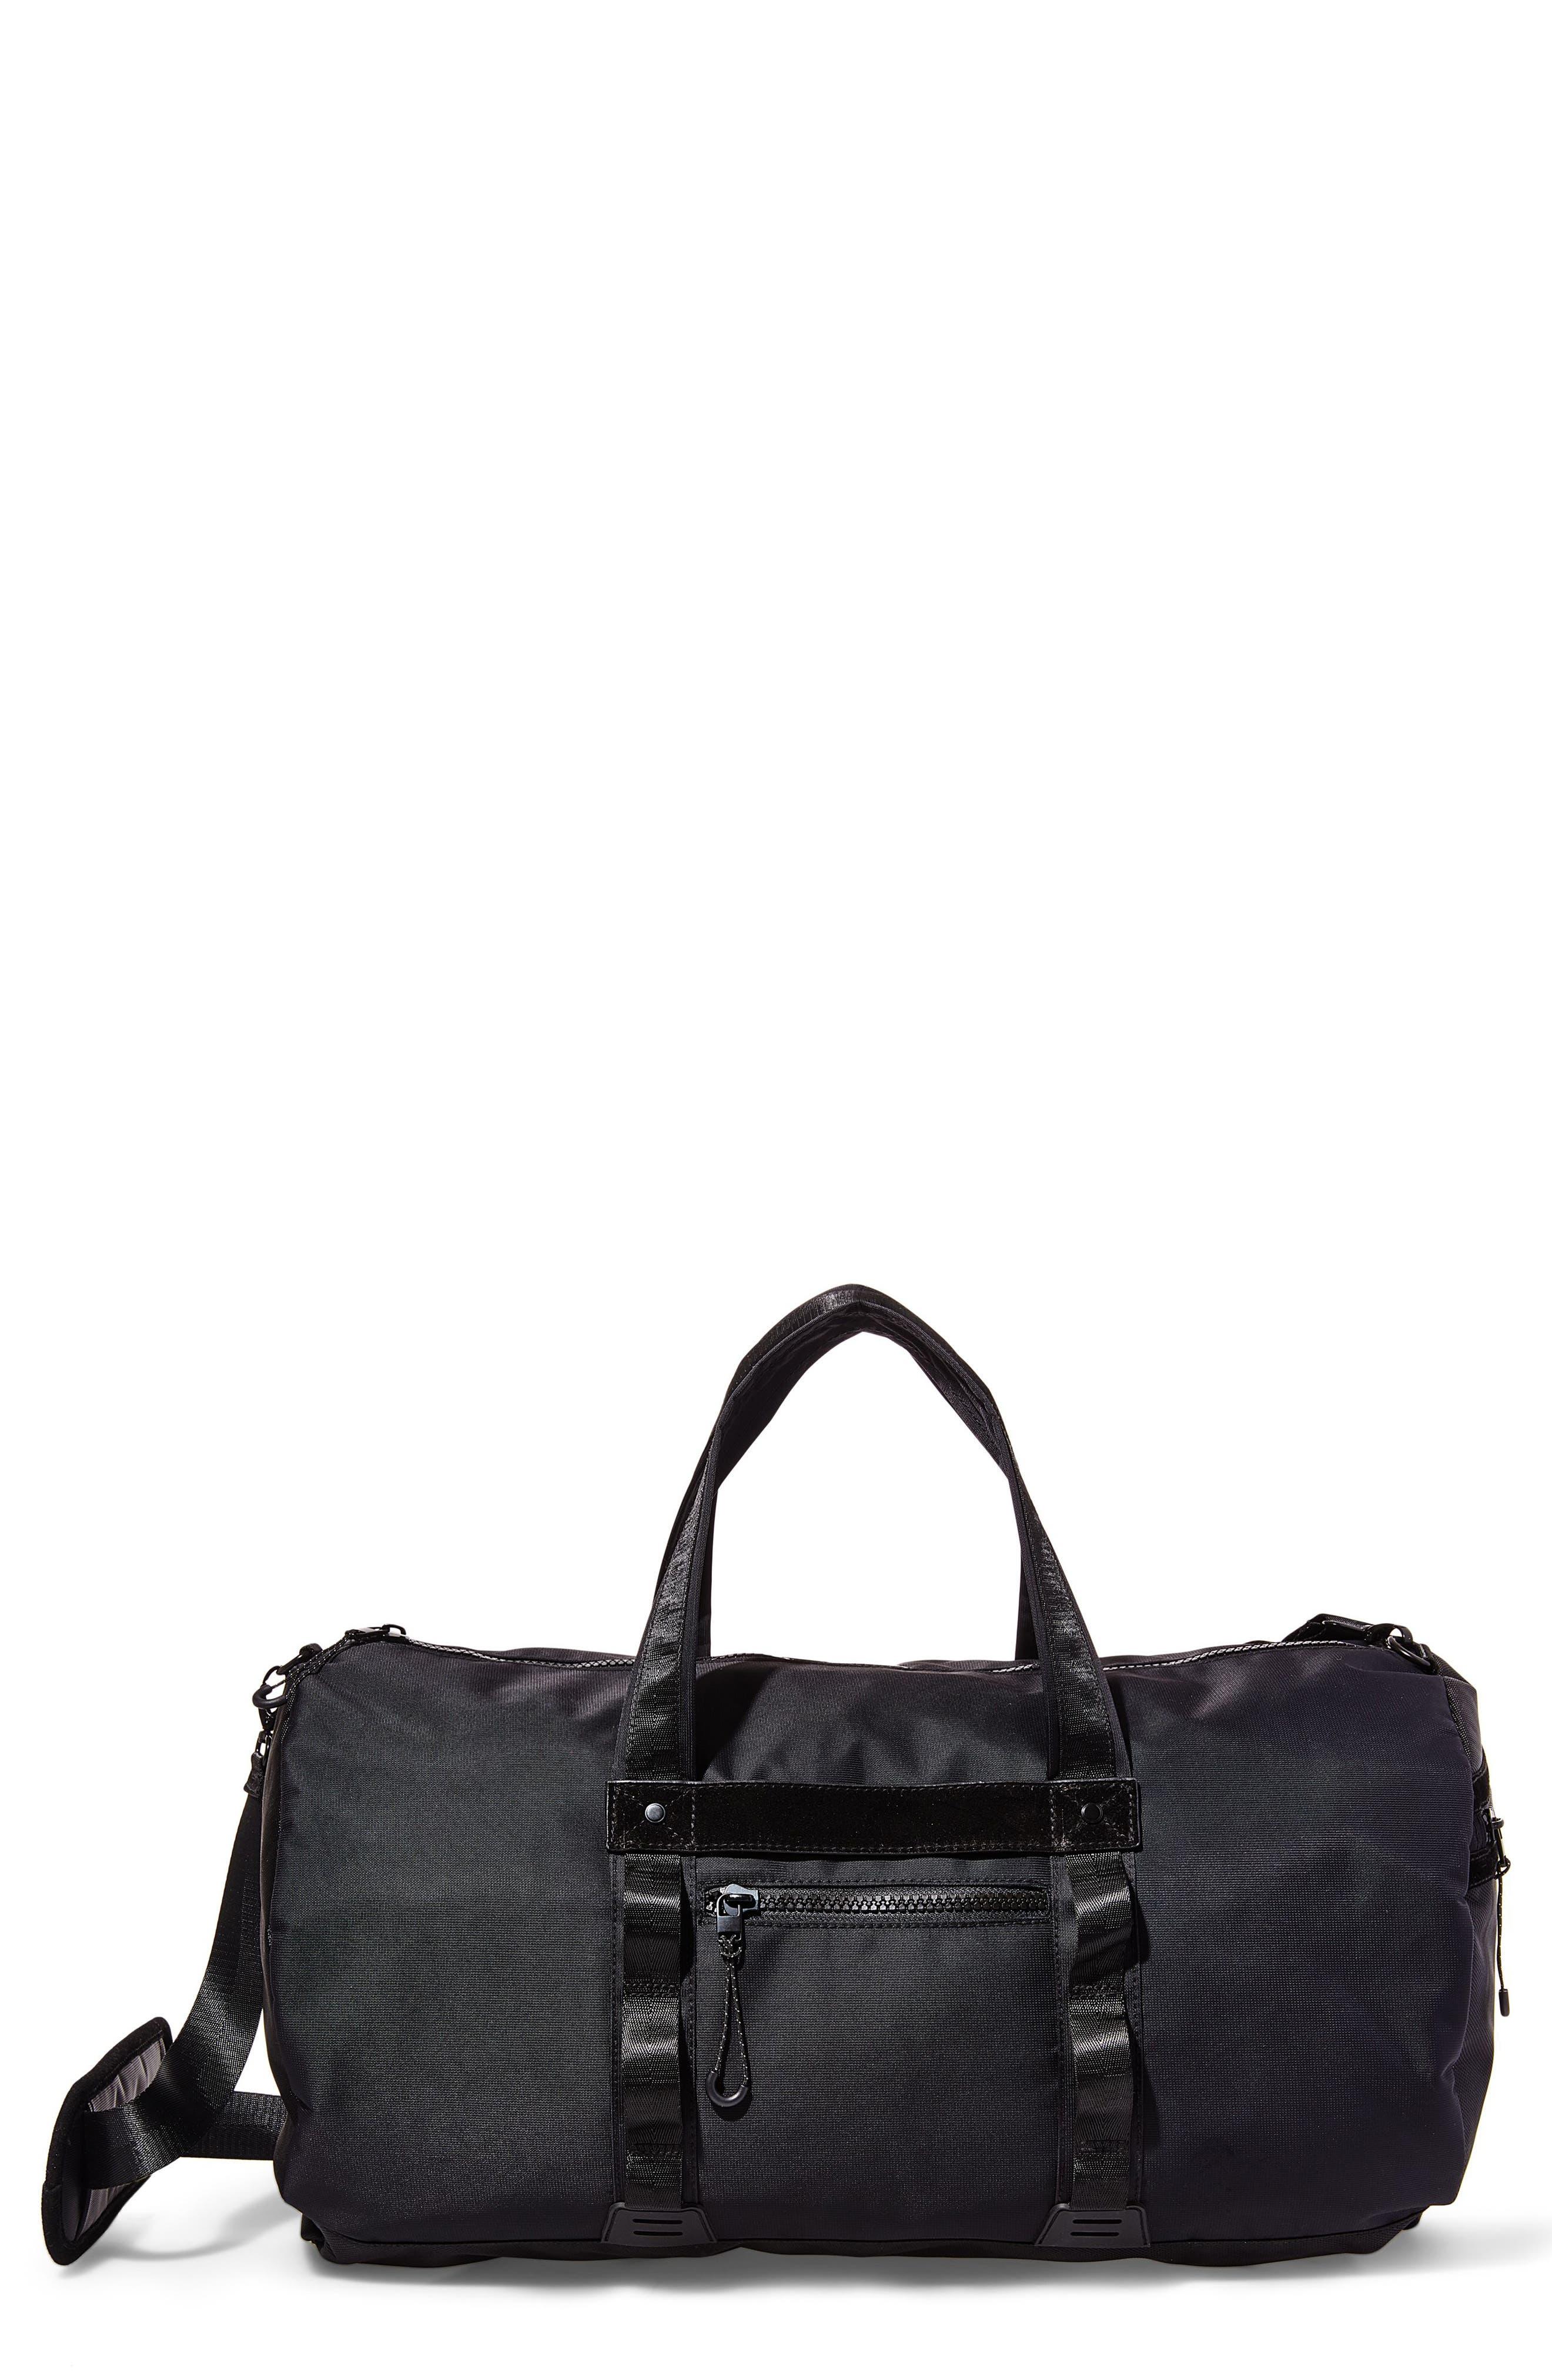 GQ x Steve Madden Duffel Bag